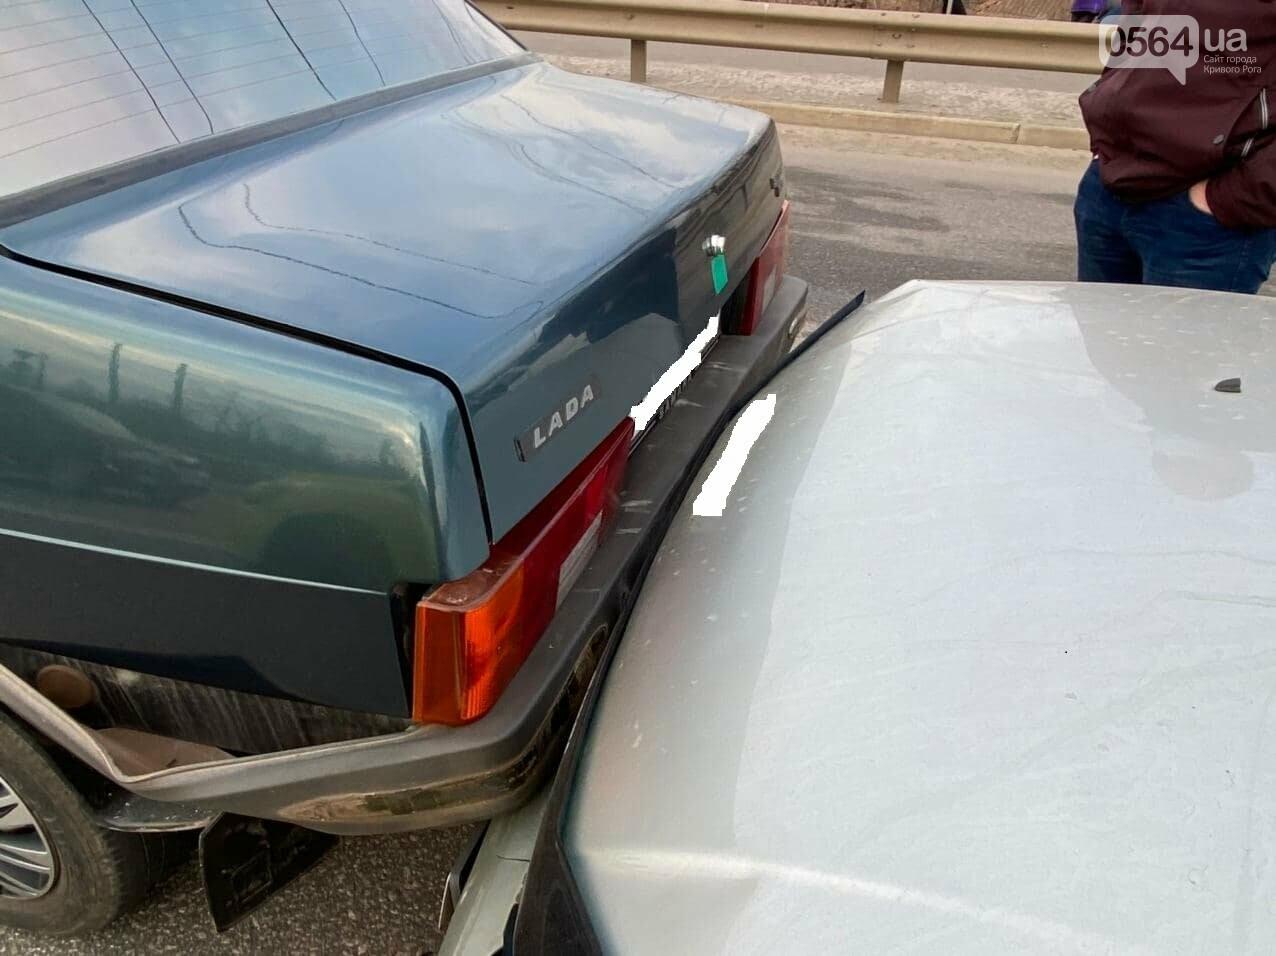 5 машин разбились в ДТП в Кривом Роге, - ФОТО, фото-6